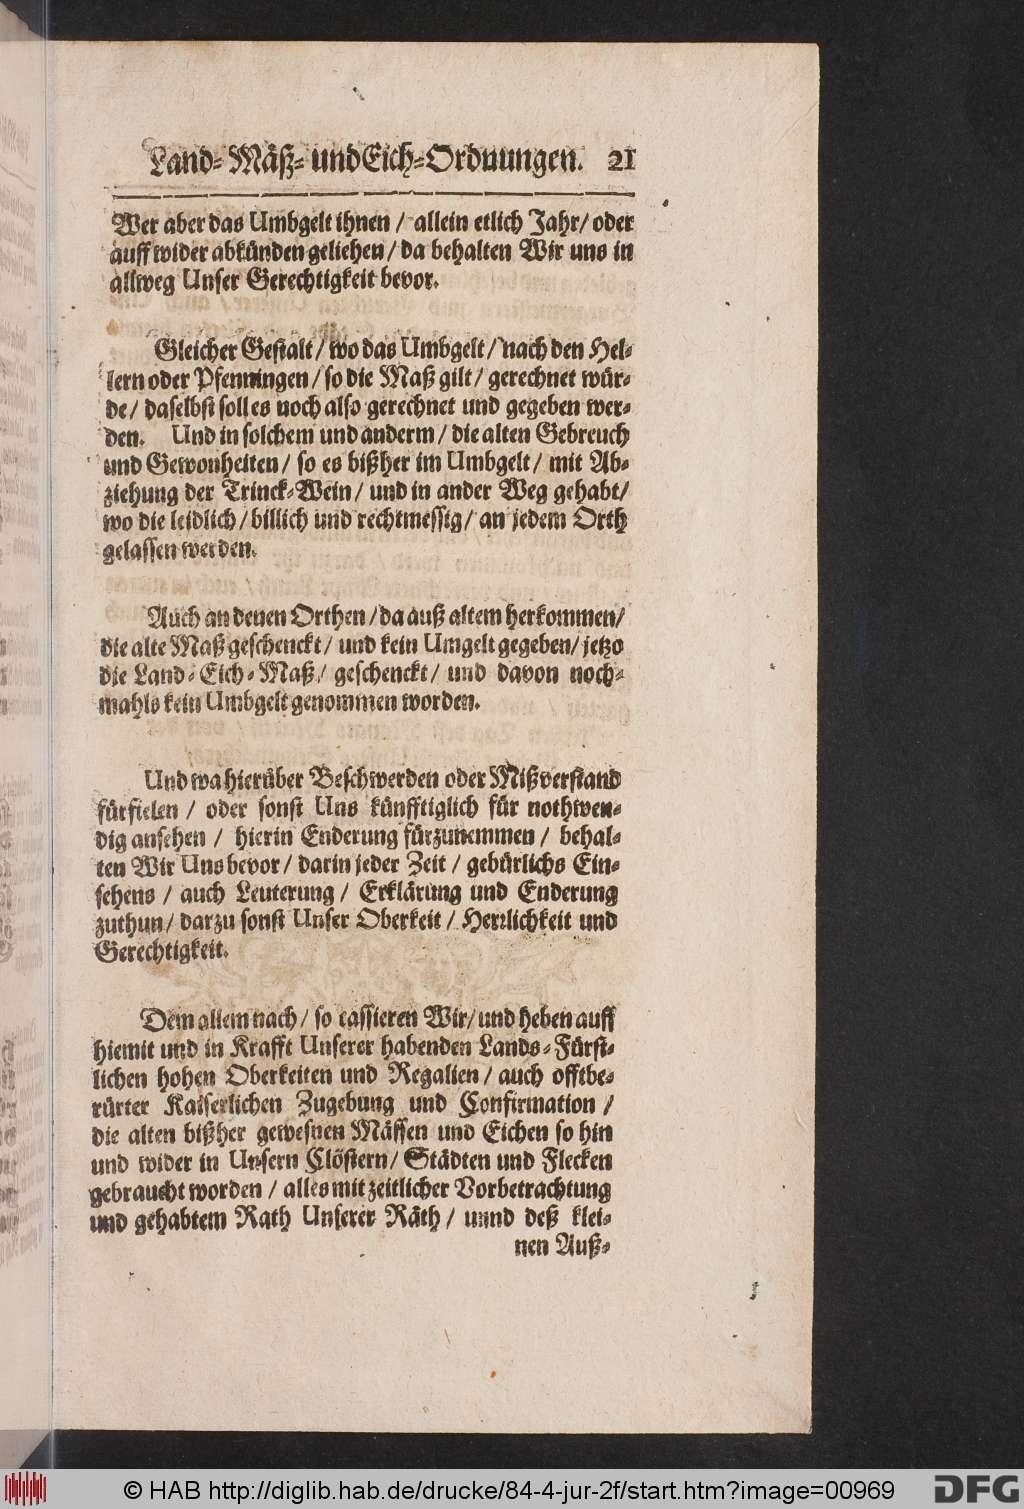 https://diglib.hab.de/drucke/84-4-jur-2f/00969.jpg